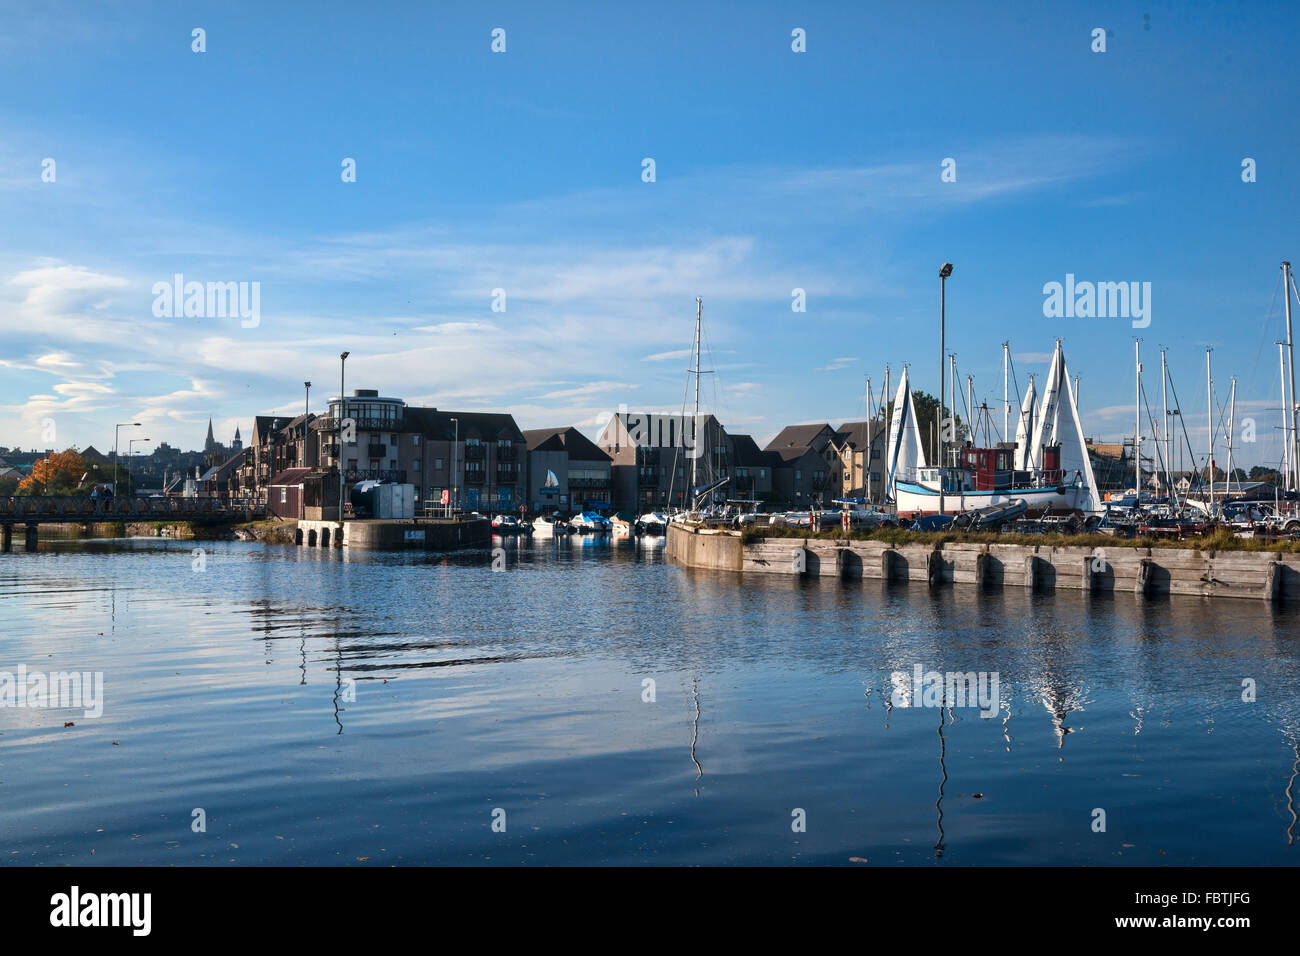 Nairn Harbour, moray Firth, Highland Region, Scotland, UK - Stock Image